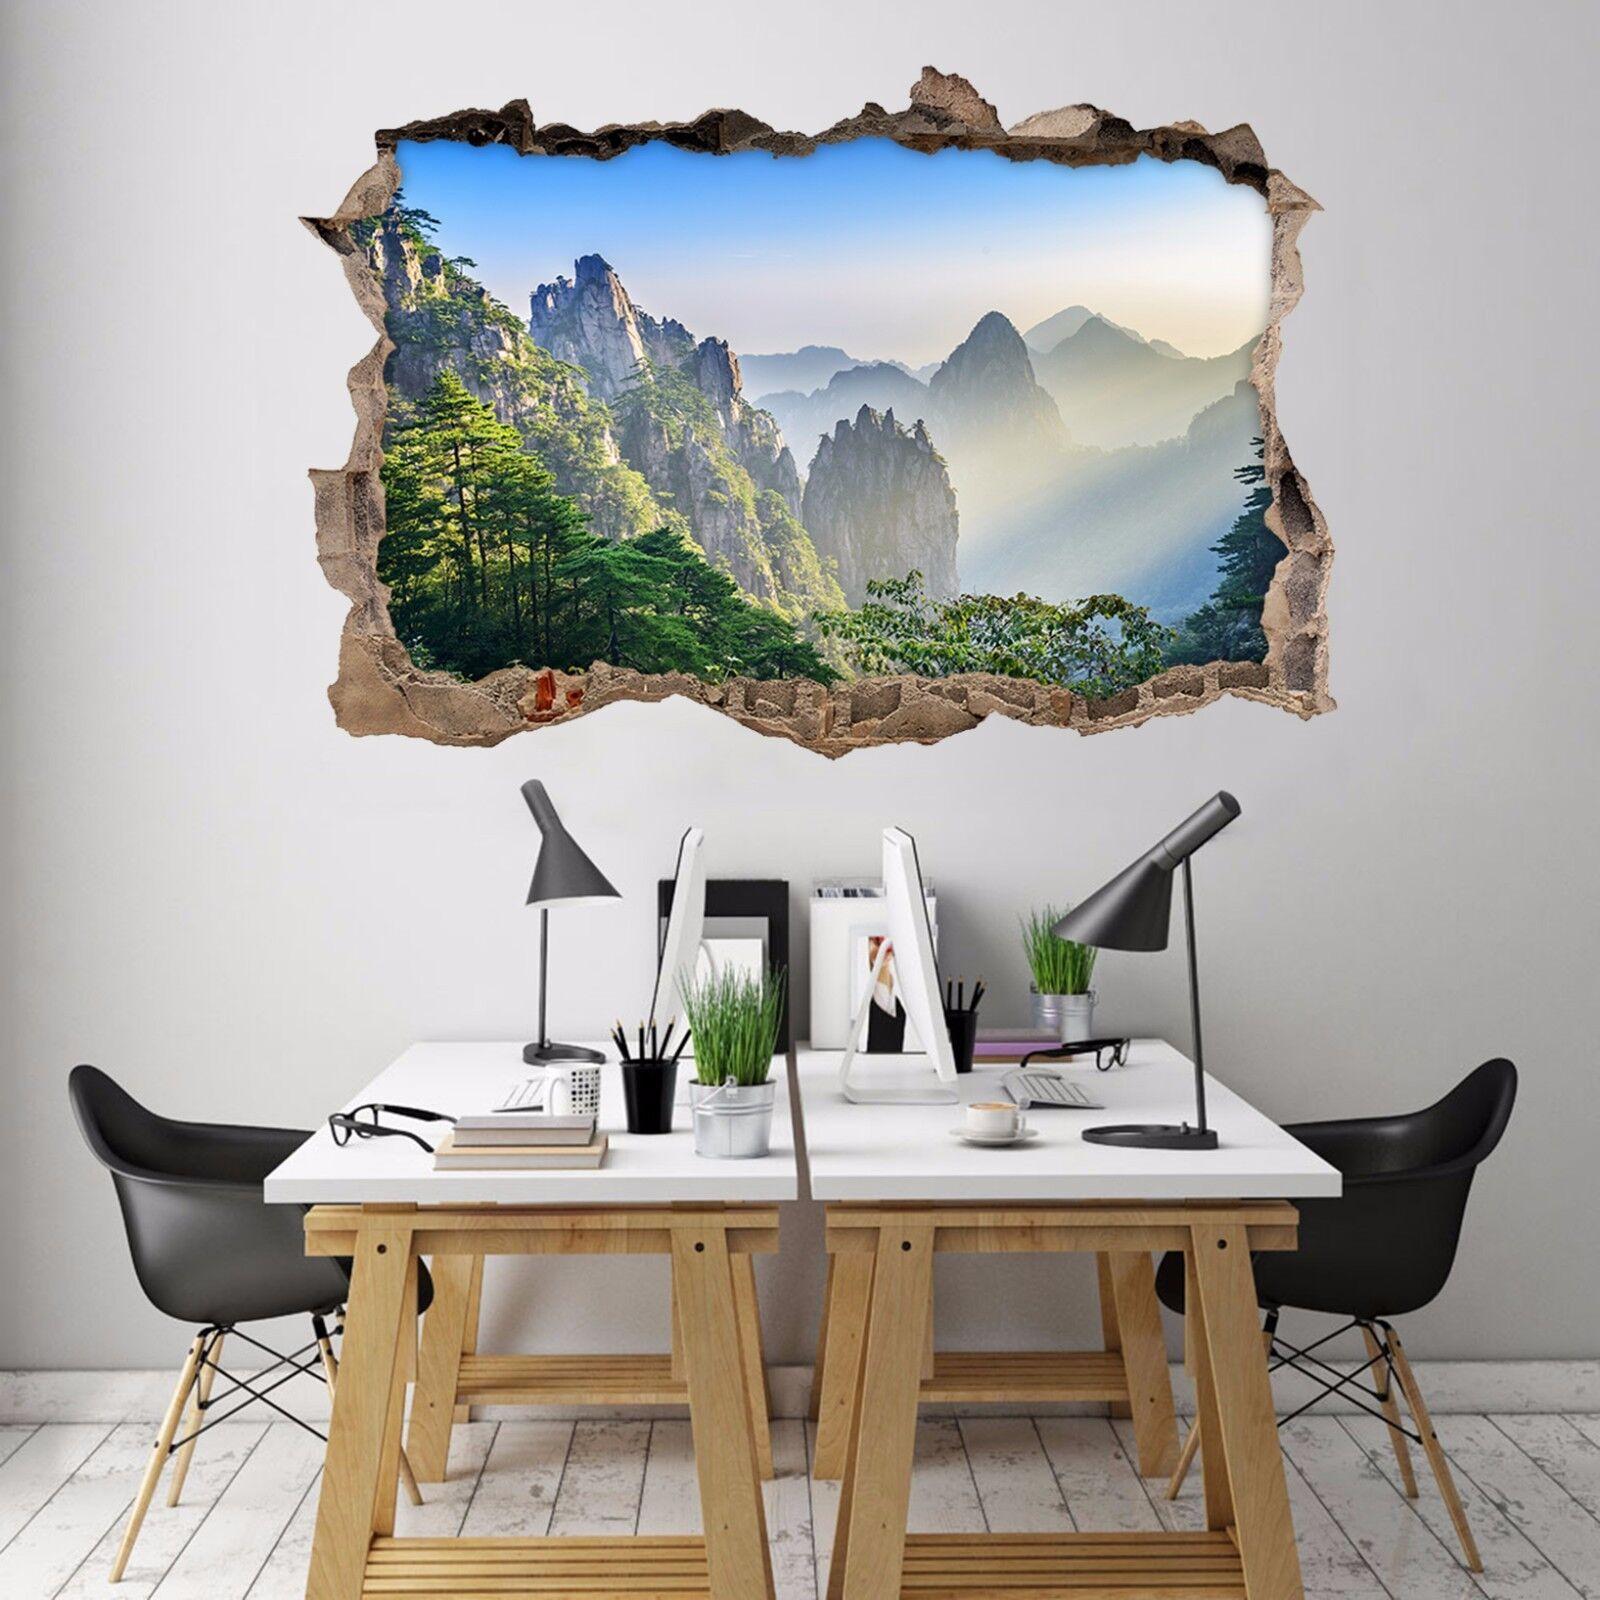 3D Vista Montagne 129 Parete Murales Adesivi Decal Sfondamento AJ WALLPAPER IT